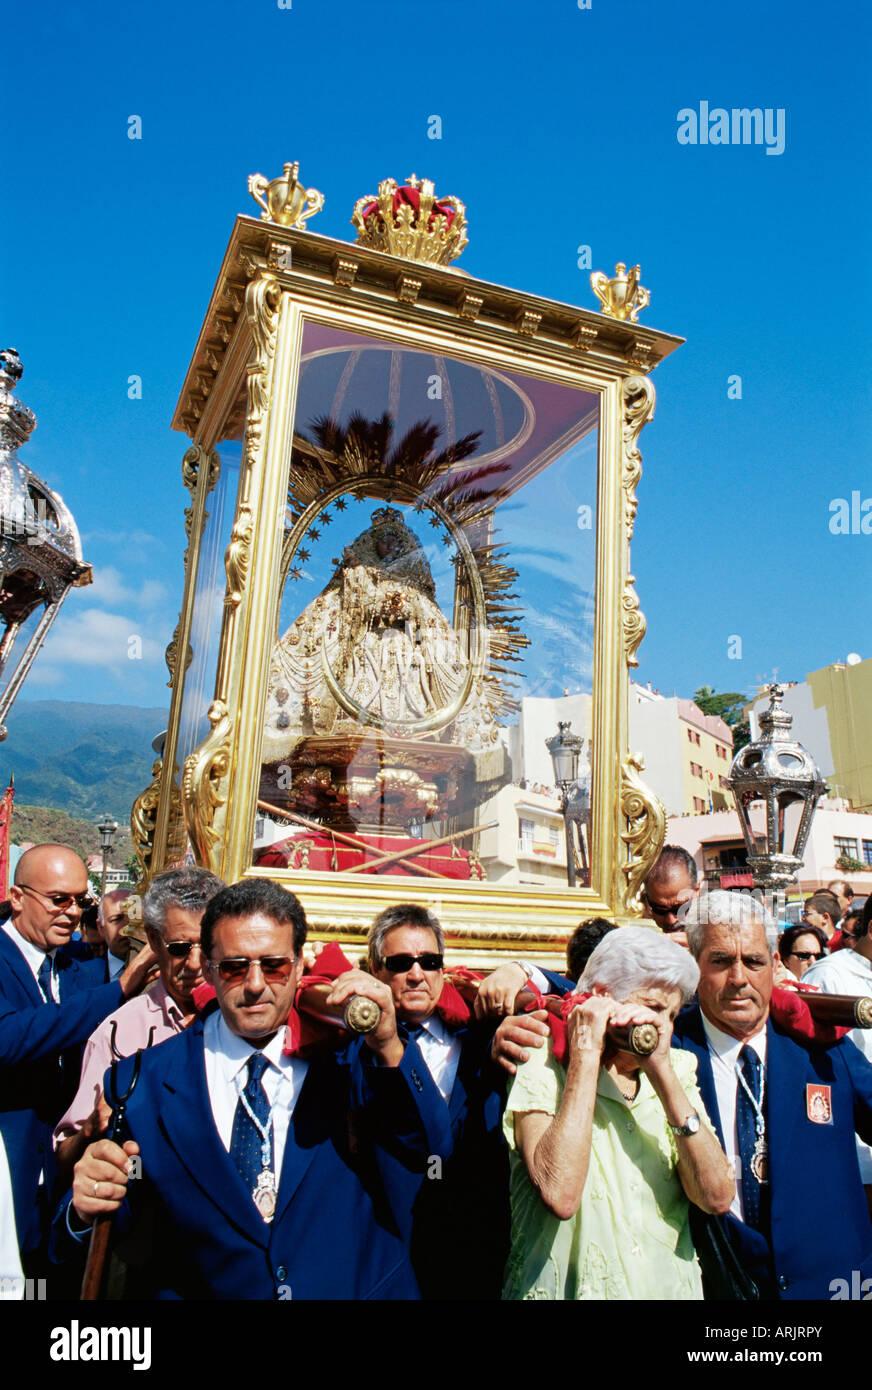 The Descent of Our Lady of Snows shrine, Santa Cruz de la Palma, La Palma, Canary Islands, Spain - Stock Image